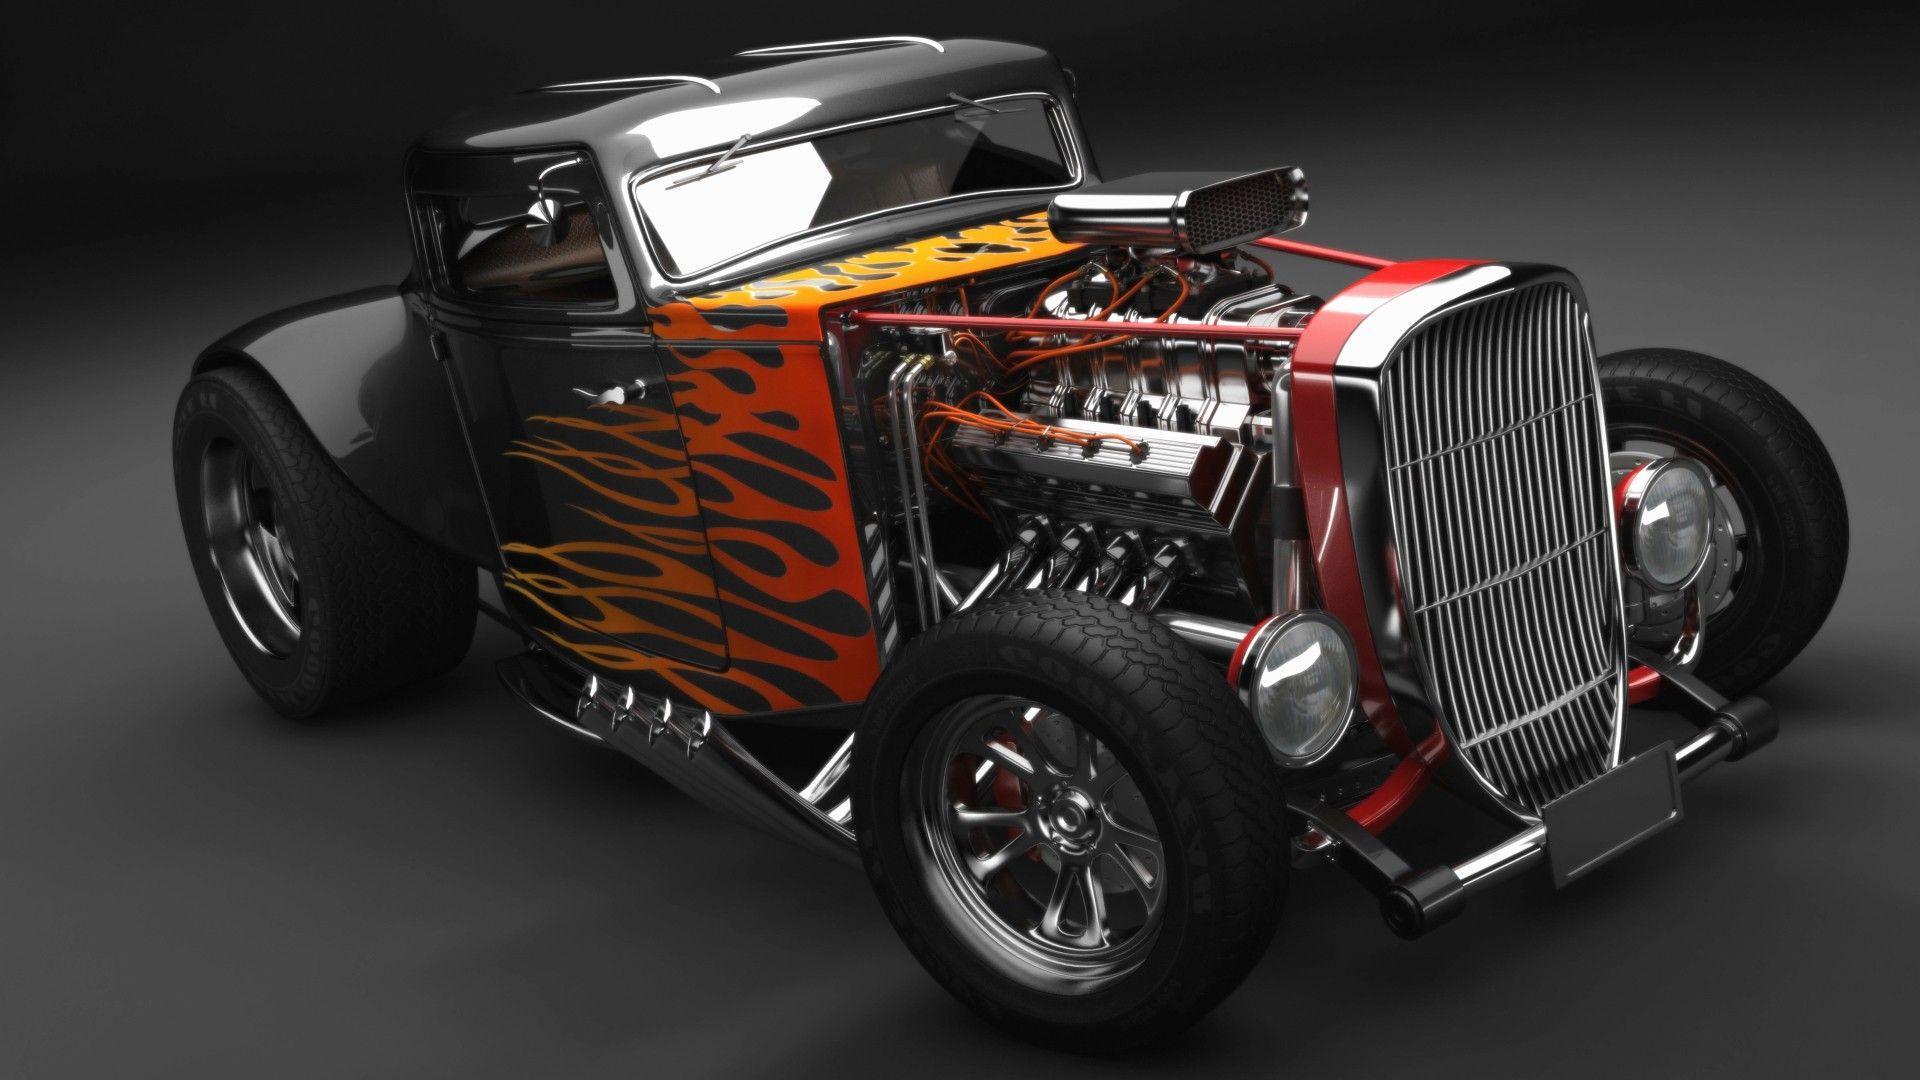 68 Best Free Classic Car Desktop Wallpapers Wallpaperaccess